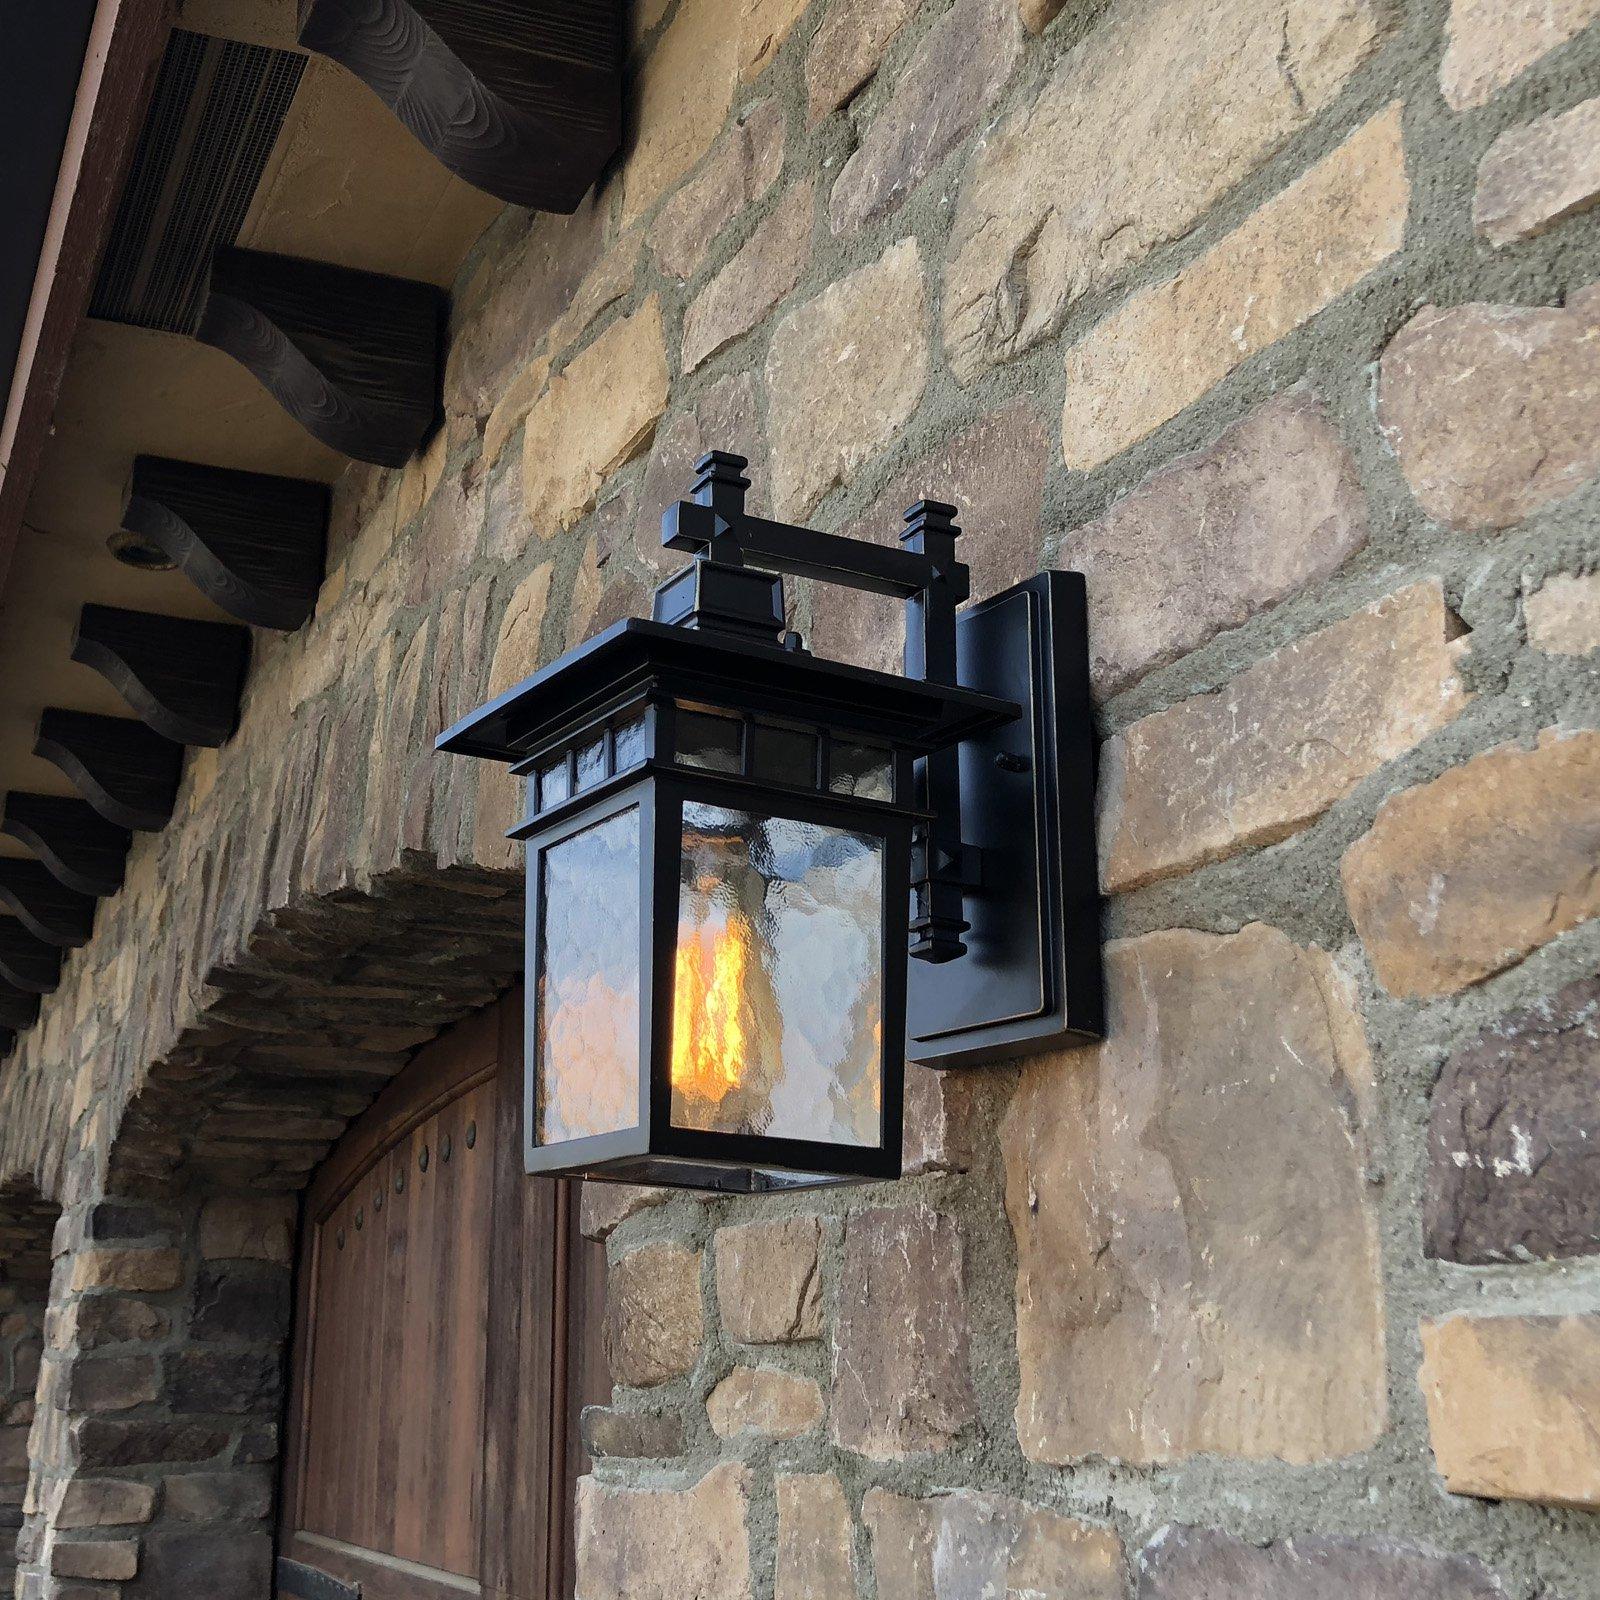 Aa Warehousing Cullen El727sbl Outdoor Wall Light In 2020 Outdoor Wall Lighting Outdoor Wall Lantern Outside Lights On House